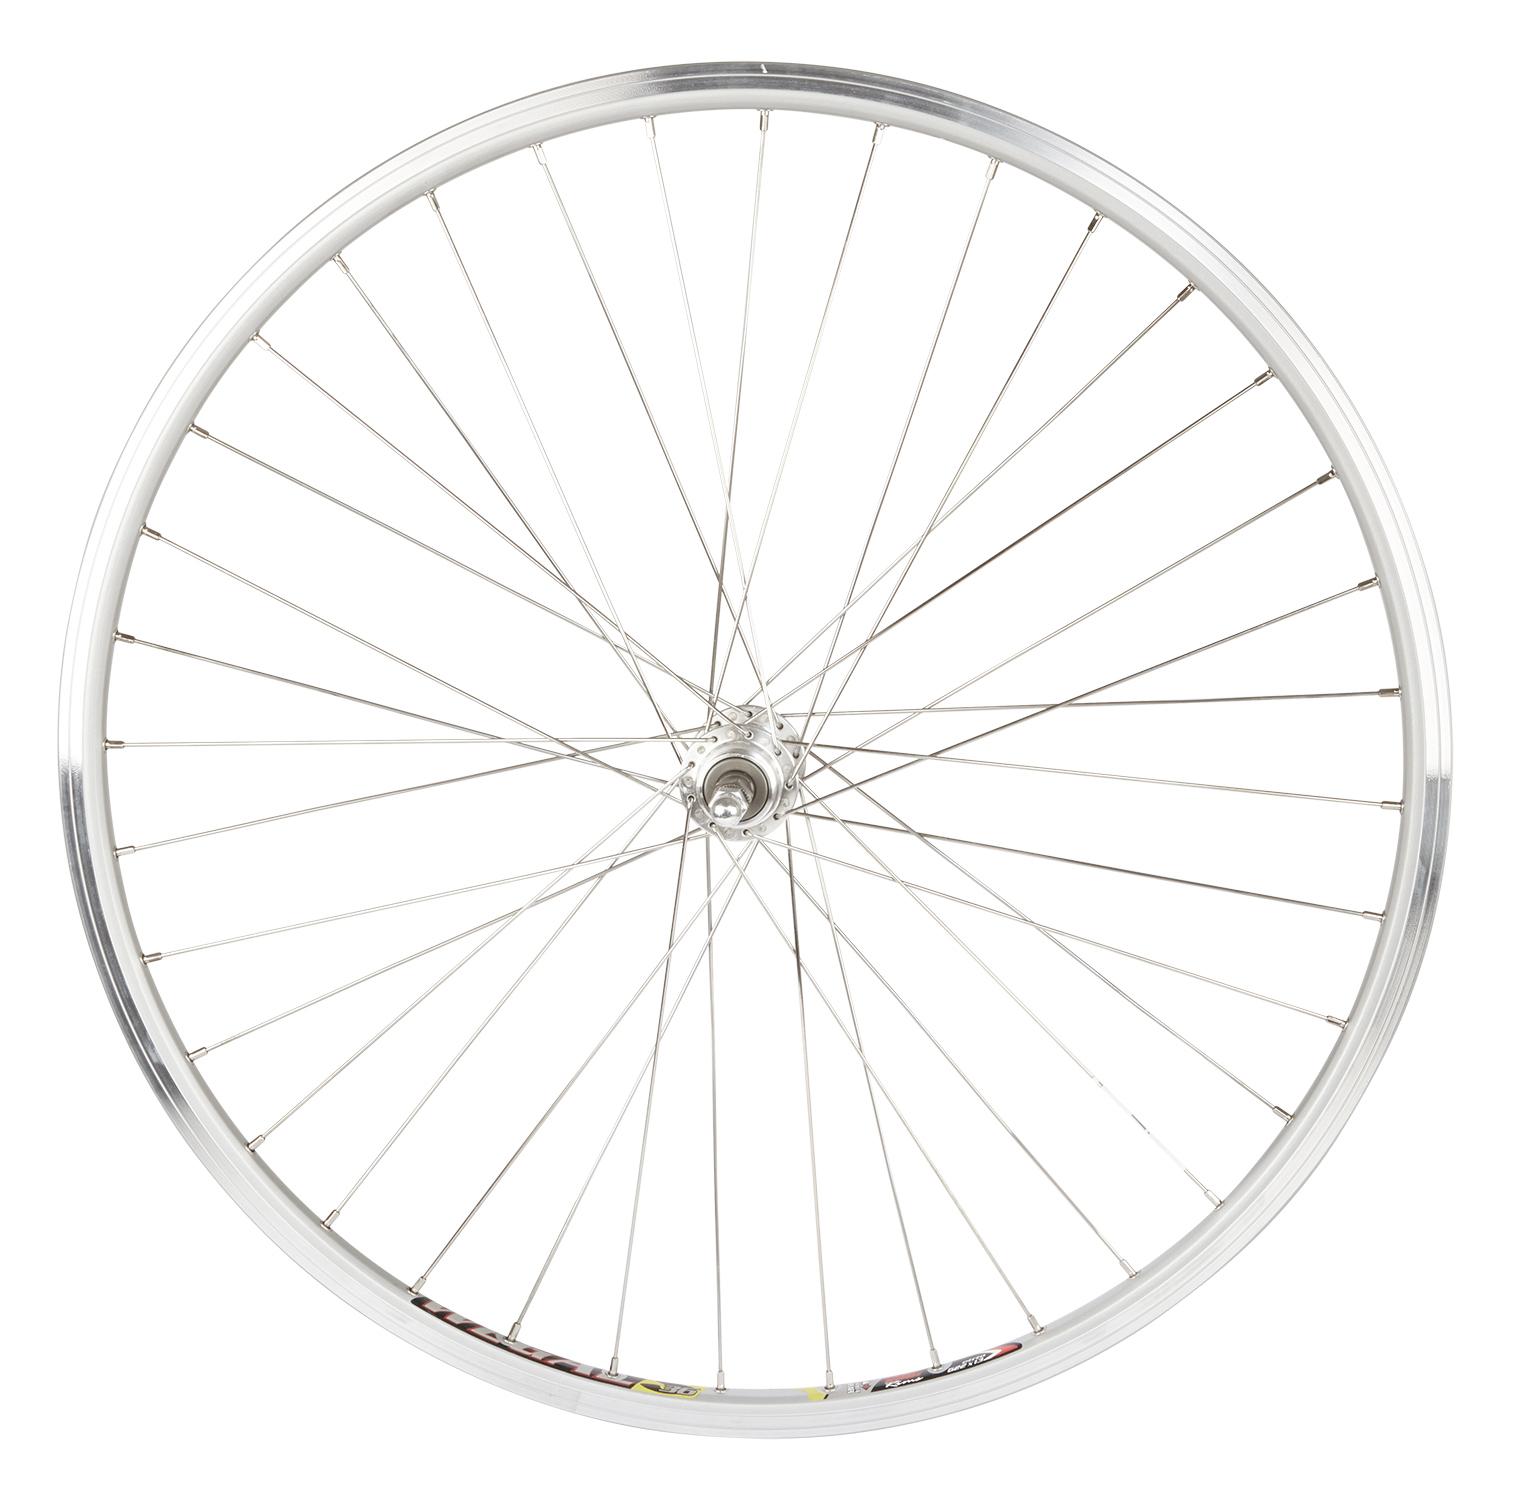 Rodi 700c baghjul - Wegal Due fælg - 13-622 - Gevind - DB 13 mm - Sølv | Rear wheel